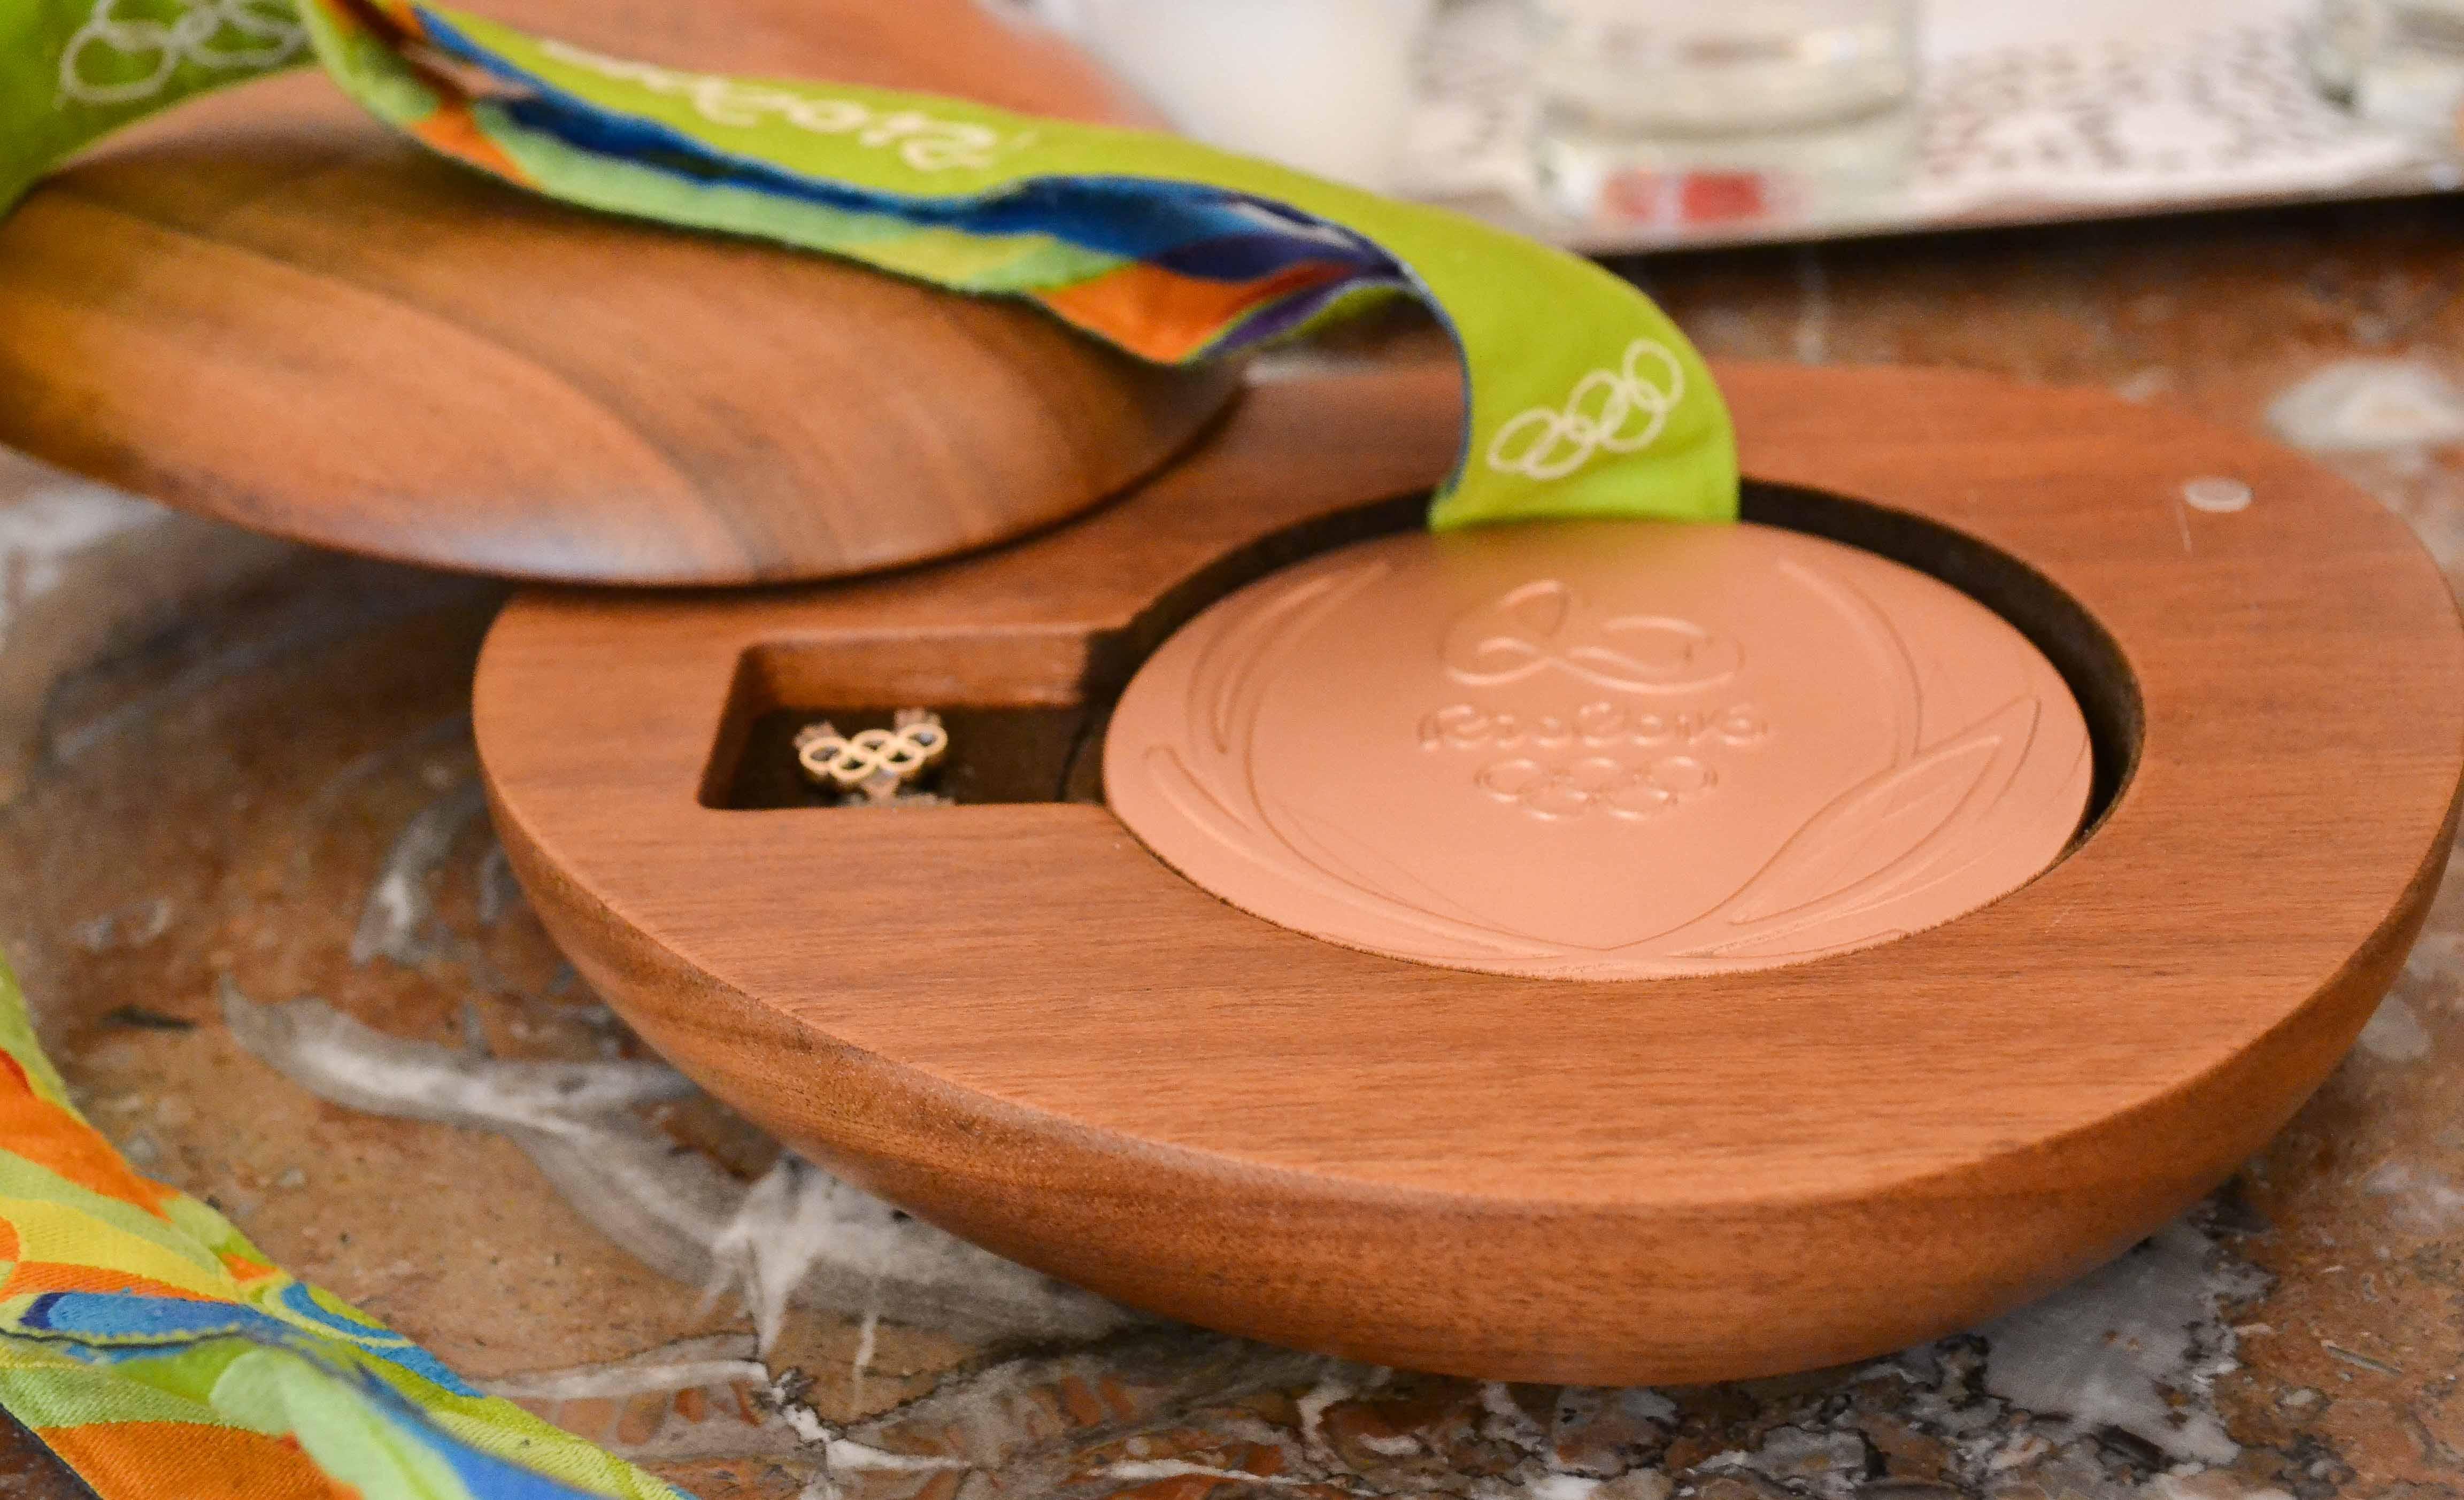 tanja-frank-interview-olympia-medaille-o%cc%88sterreich-klara-fuchs-fitnessblog-2